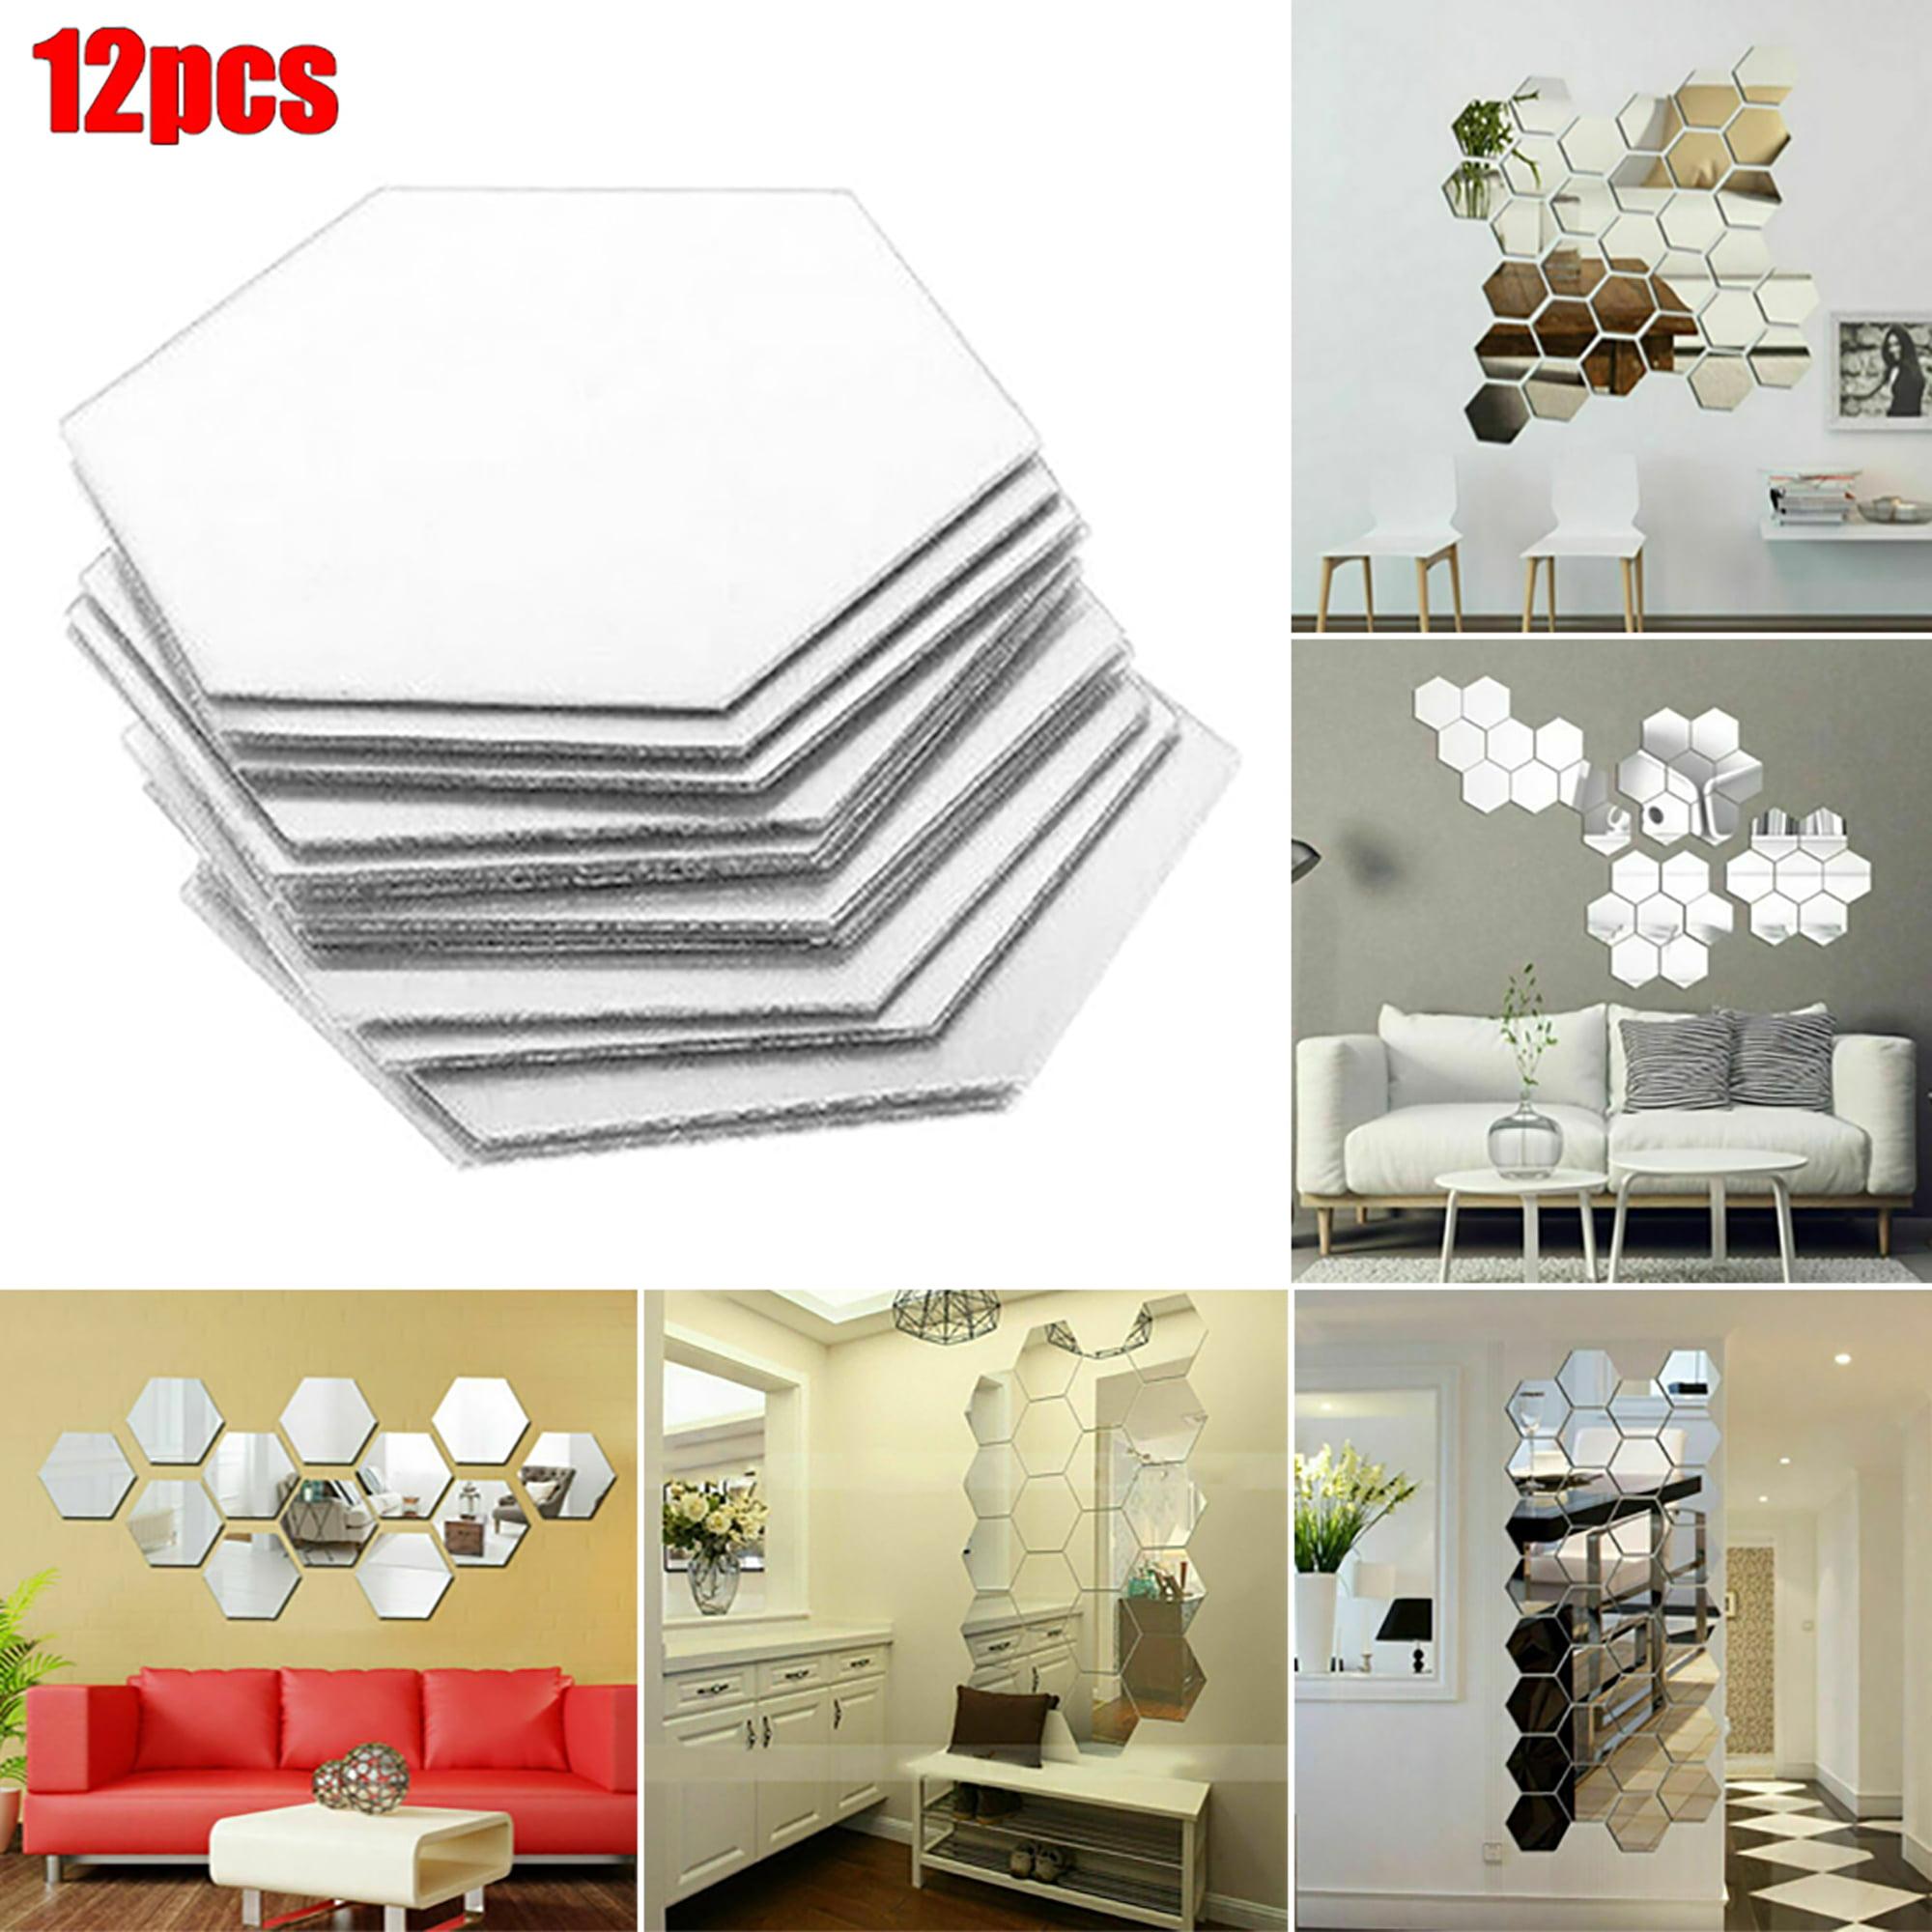 12//24Pcs Mosaic Mirror Tile Wall Stickers DIY Art Decal Decor Self Adhesive Home